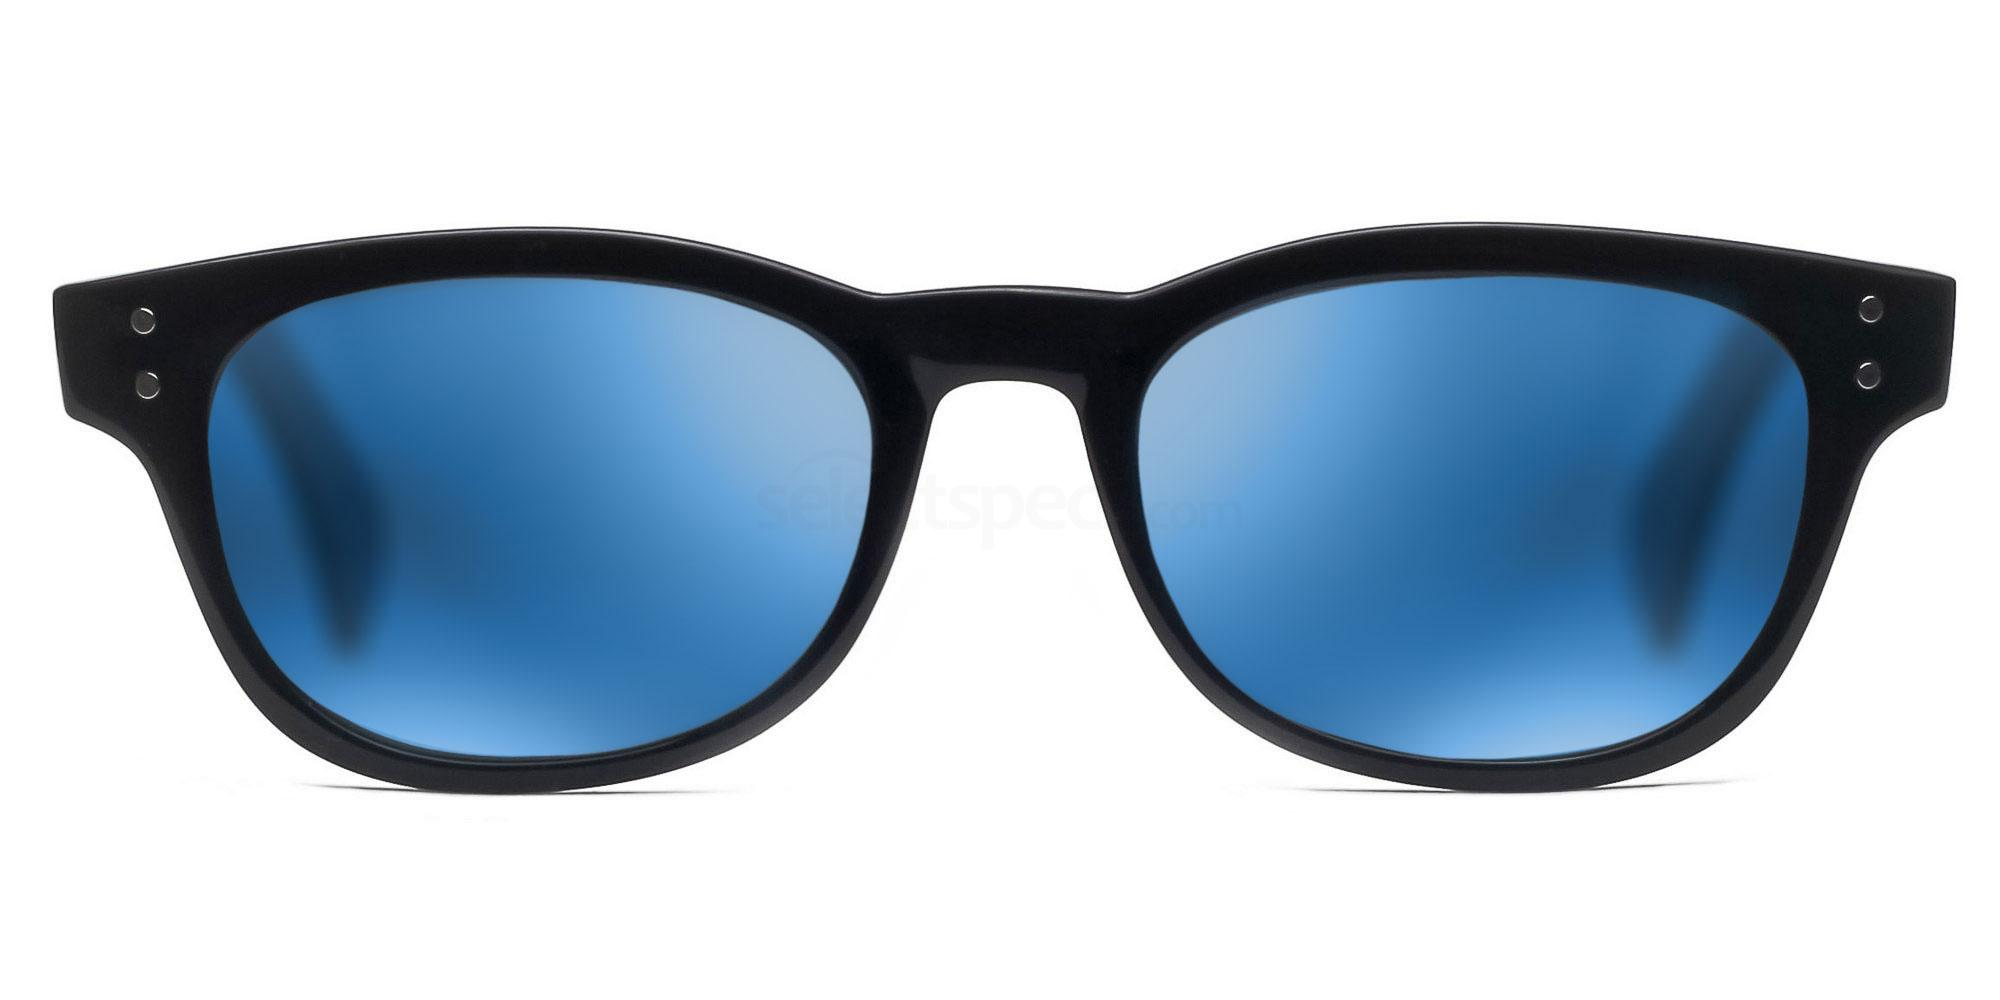 C01 Polarized Grey with Blue Mirror P2249 Shiny Black (Mirrored Polarized) Sunglasses, Savannah